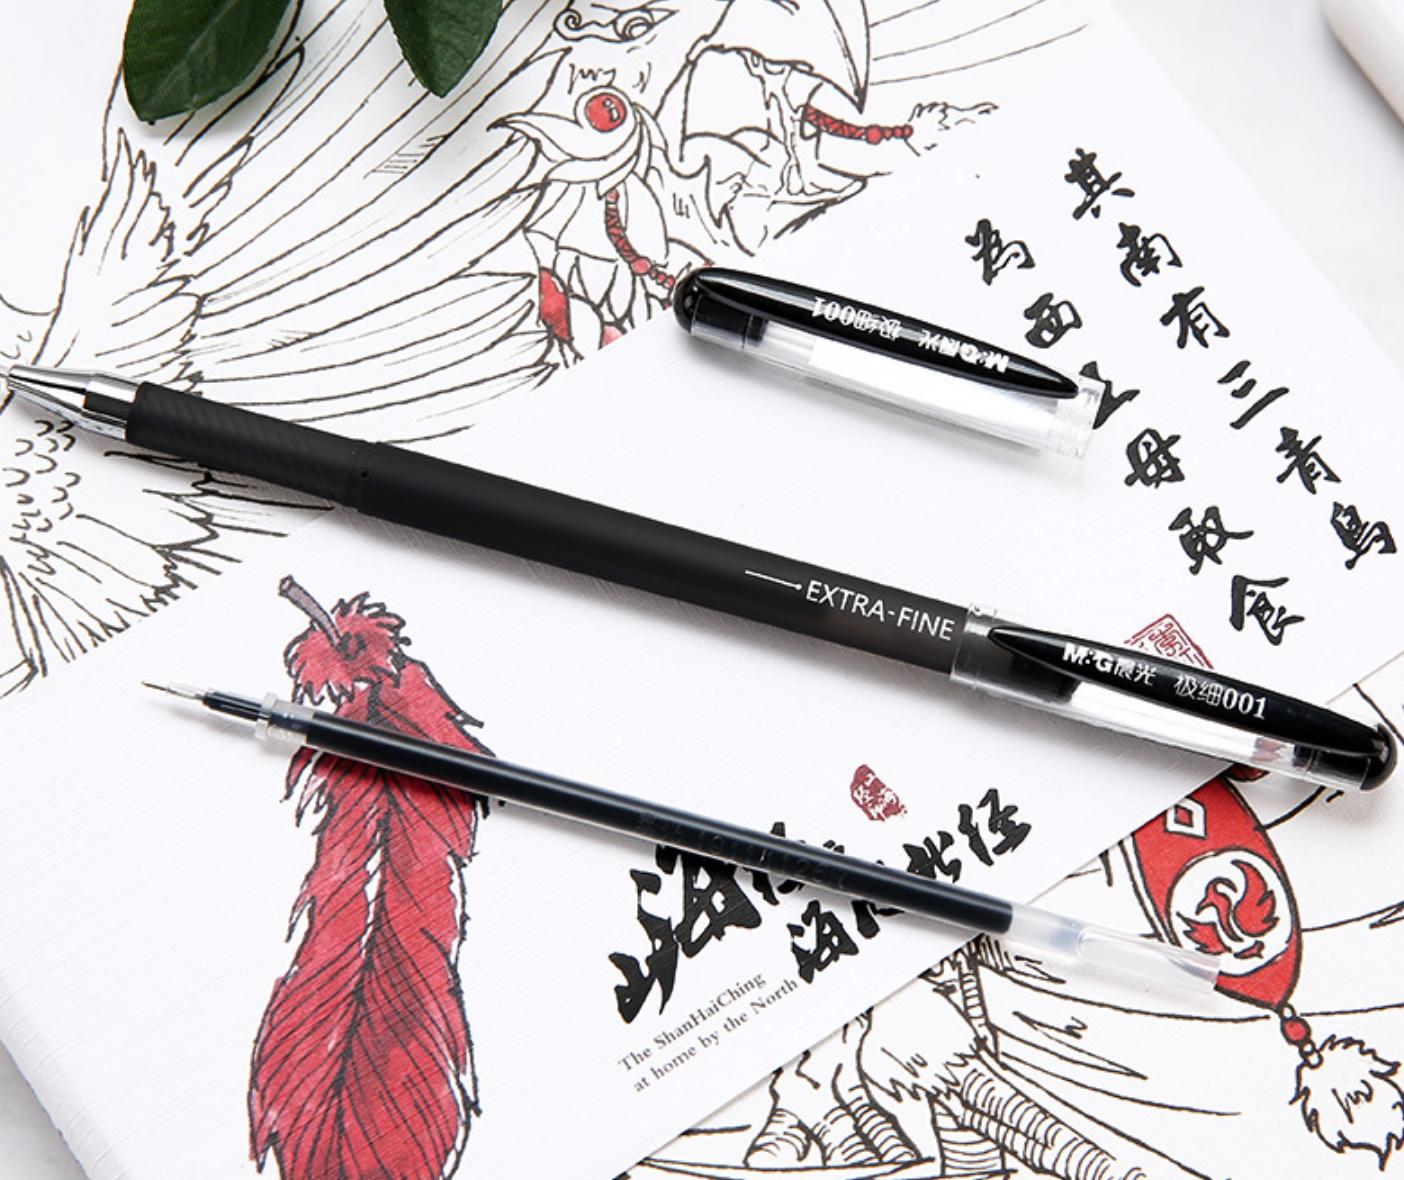 AGPA4003A 0.2mm Black Gel Ink Pen